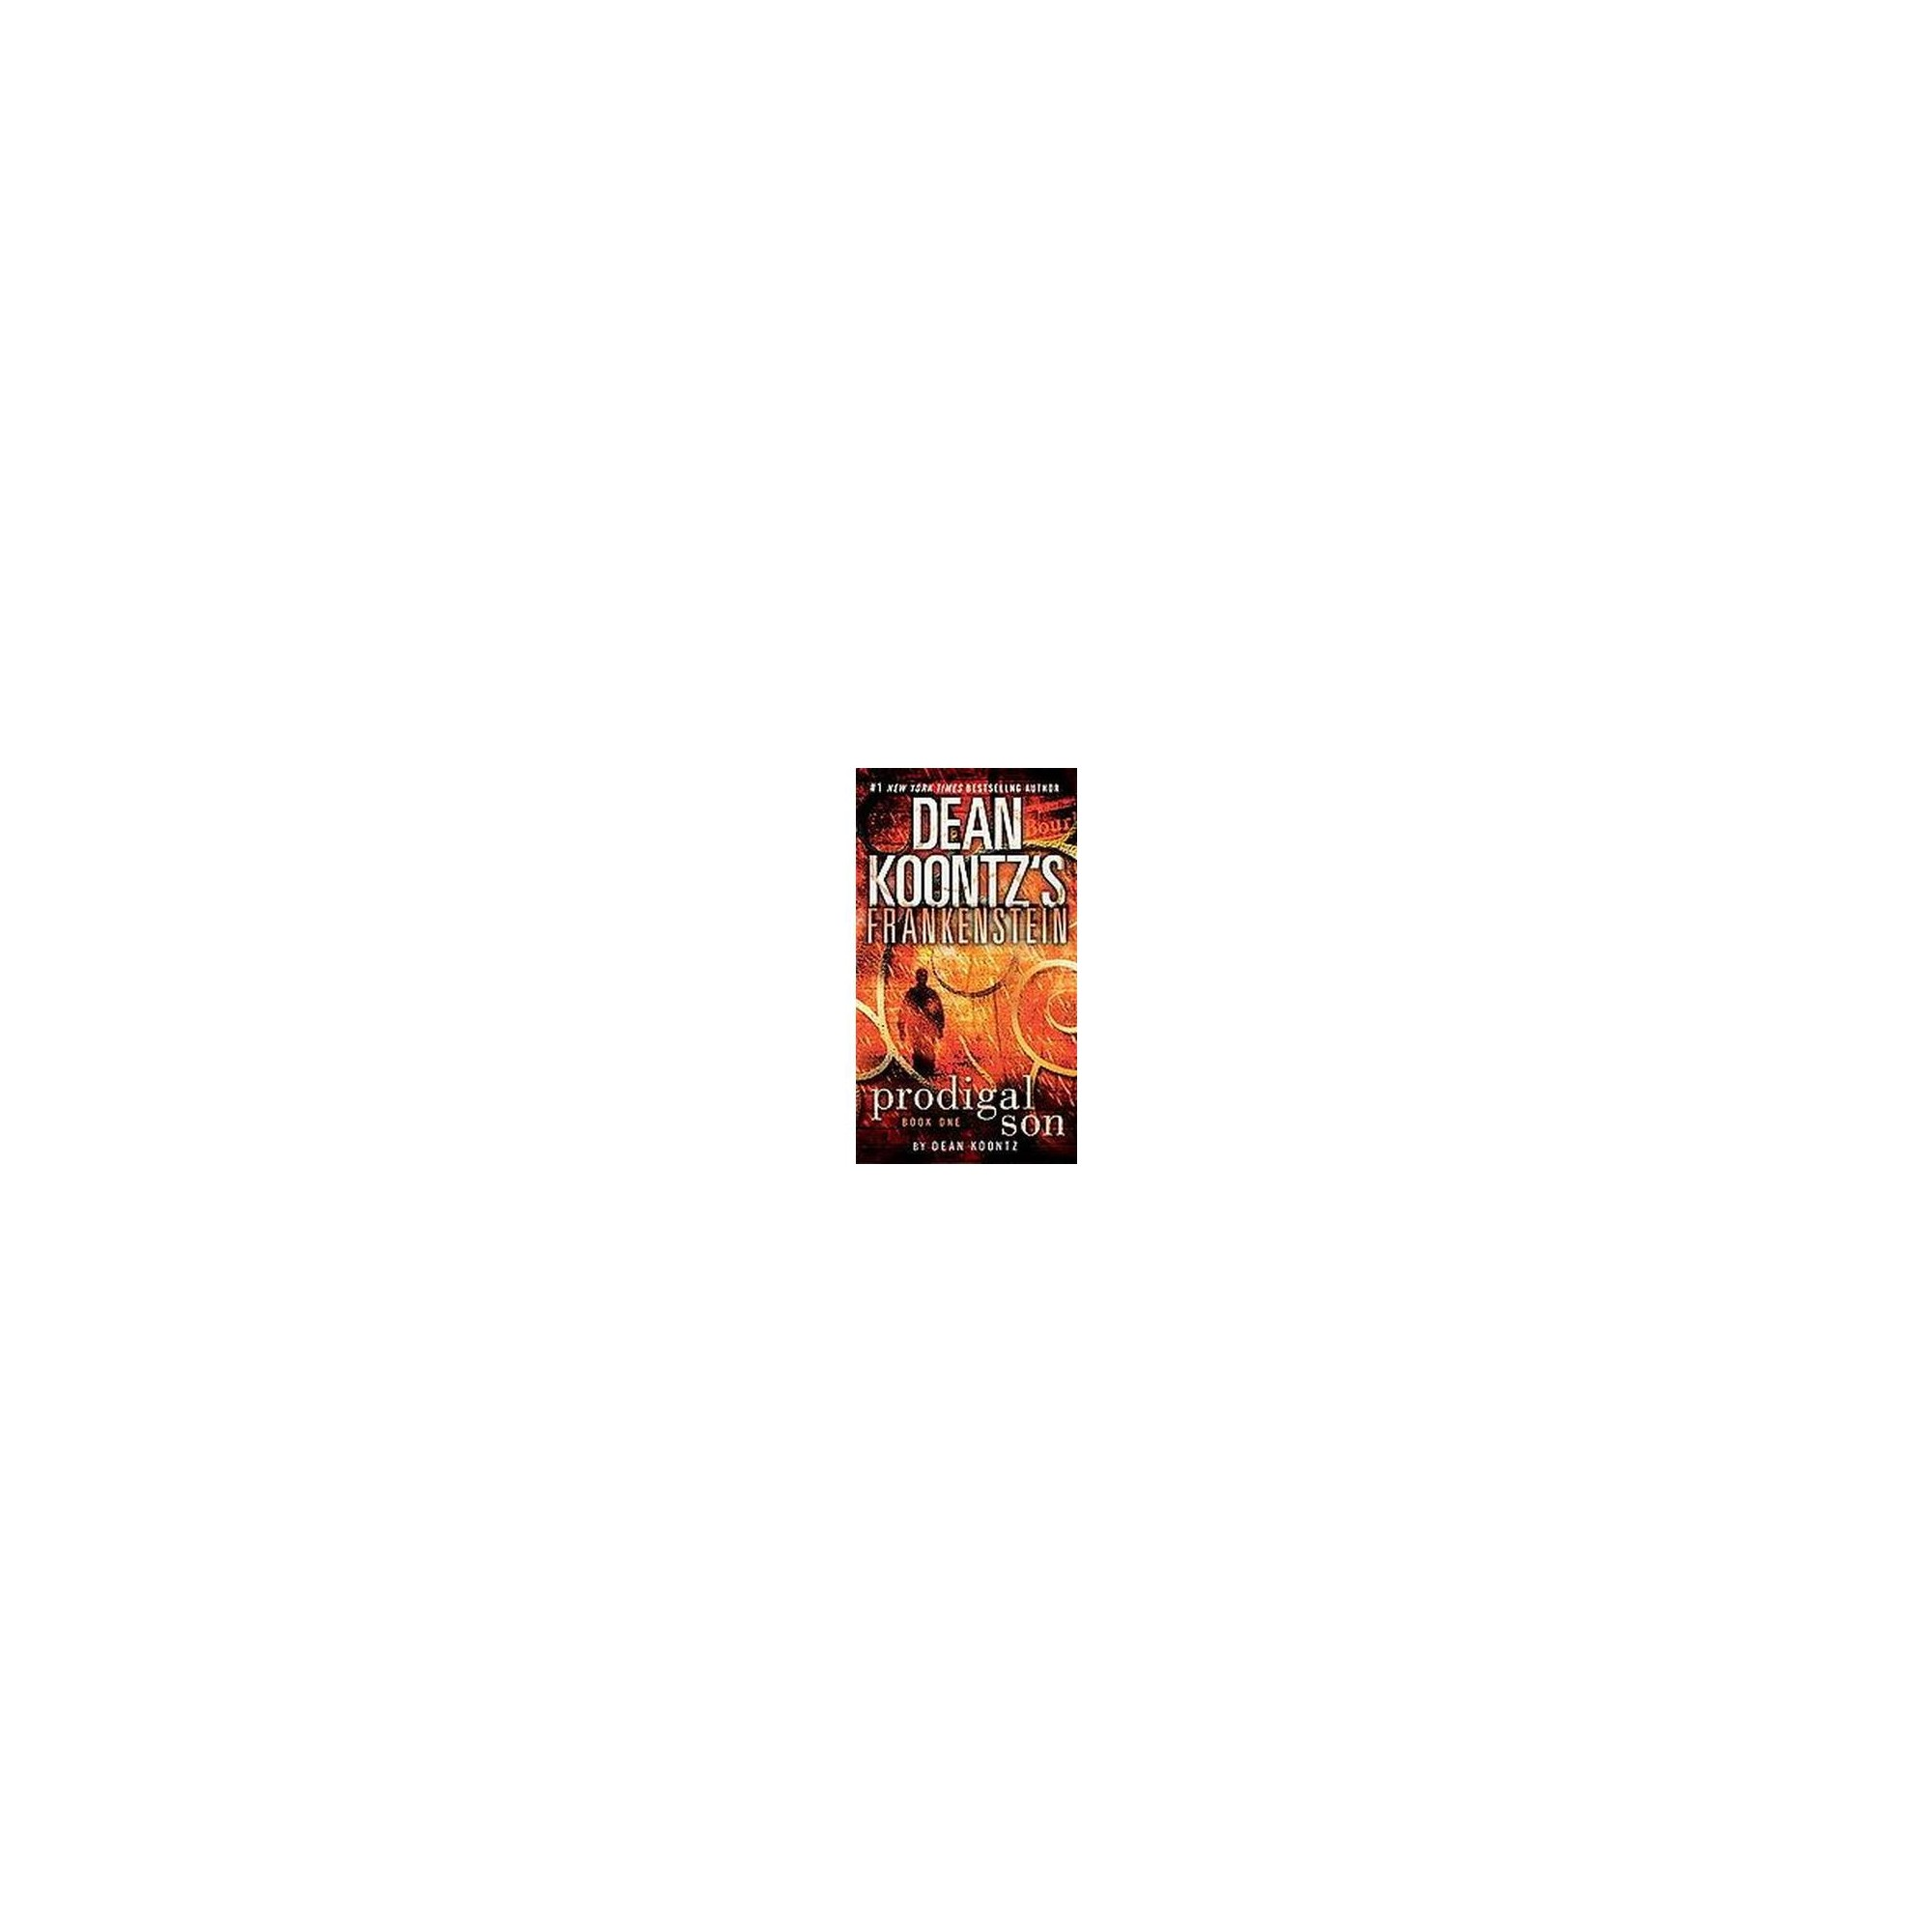 19+ Prodigal son book series info